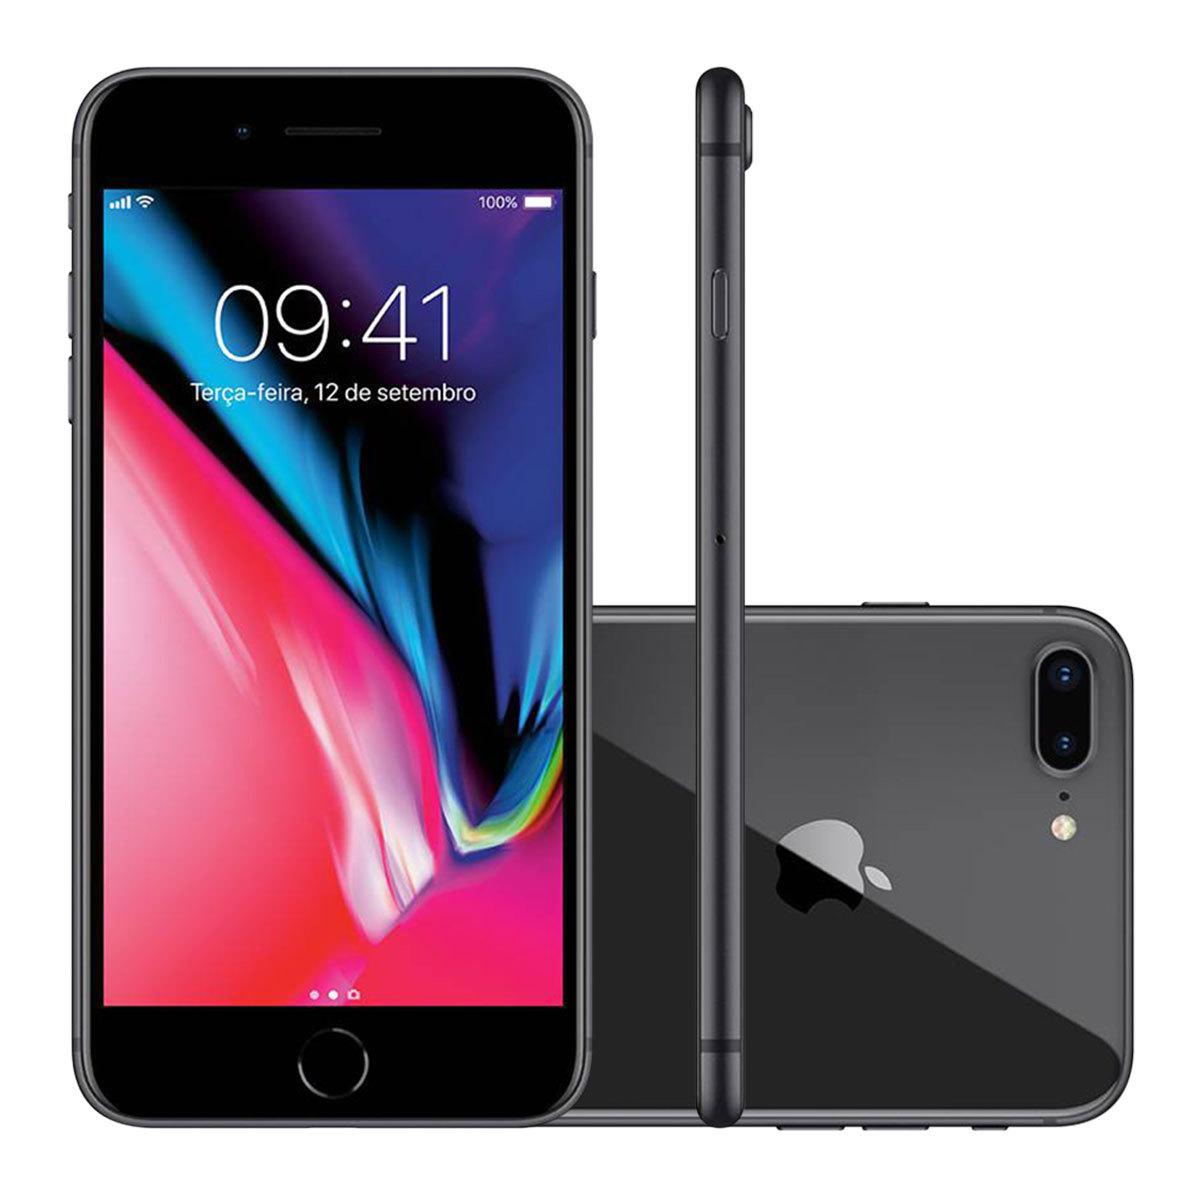 Iphone 8 Plus 256gb Cinza Espacial 4g Tela 5,5 12mp Ios 11